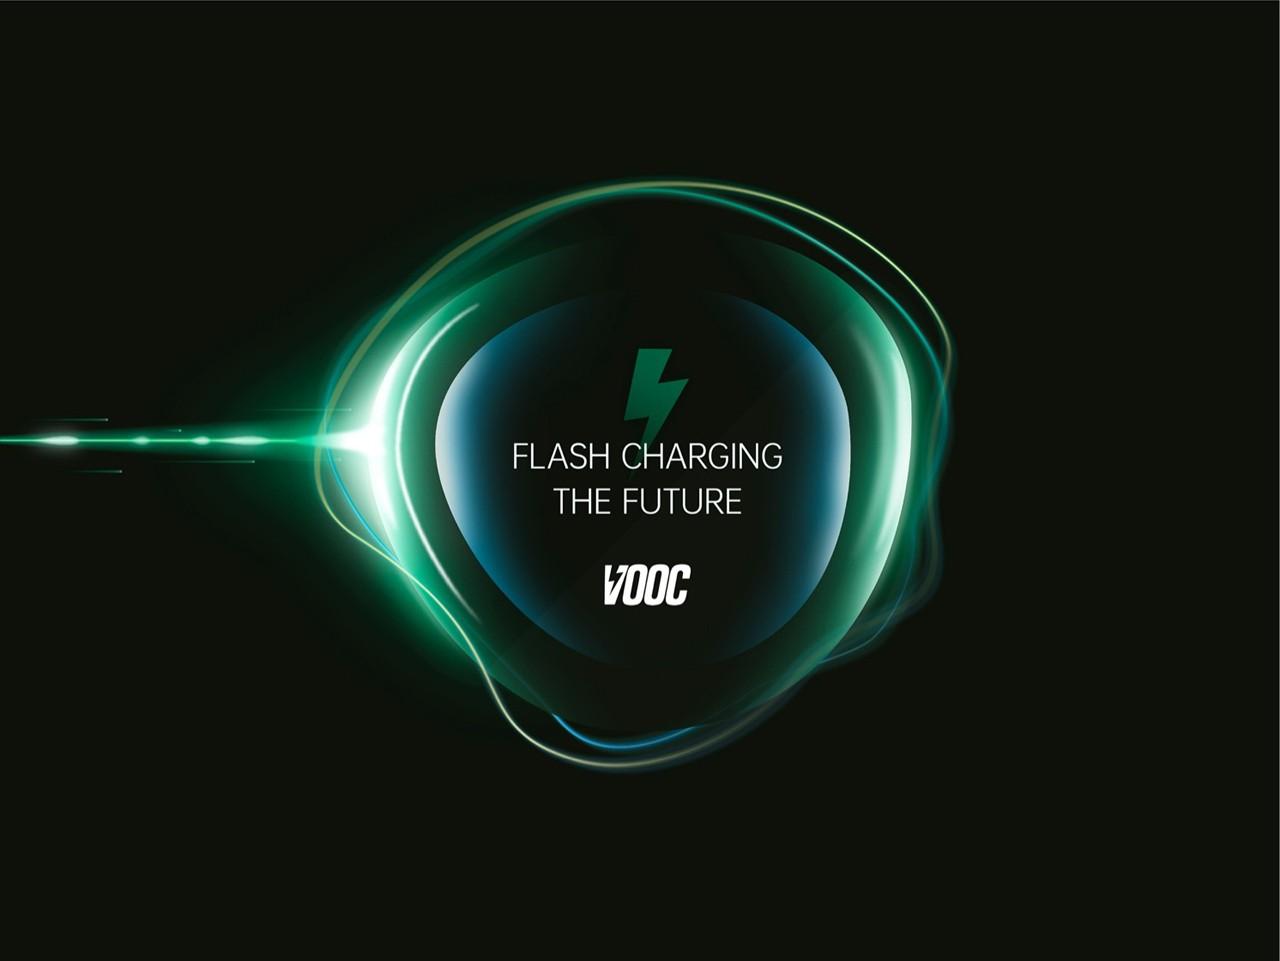 OPPO Flash Charging Future